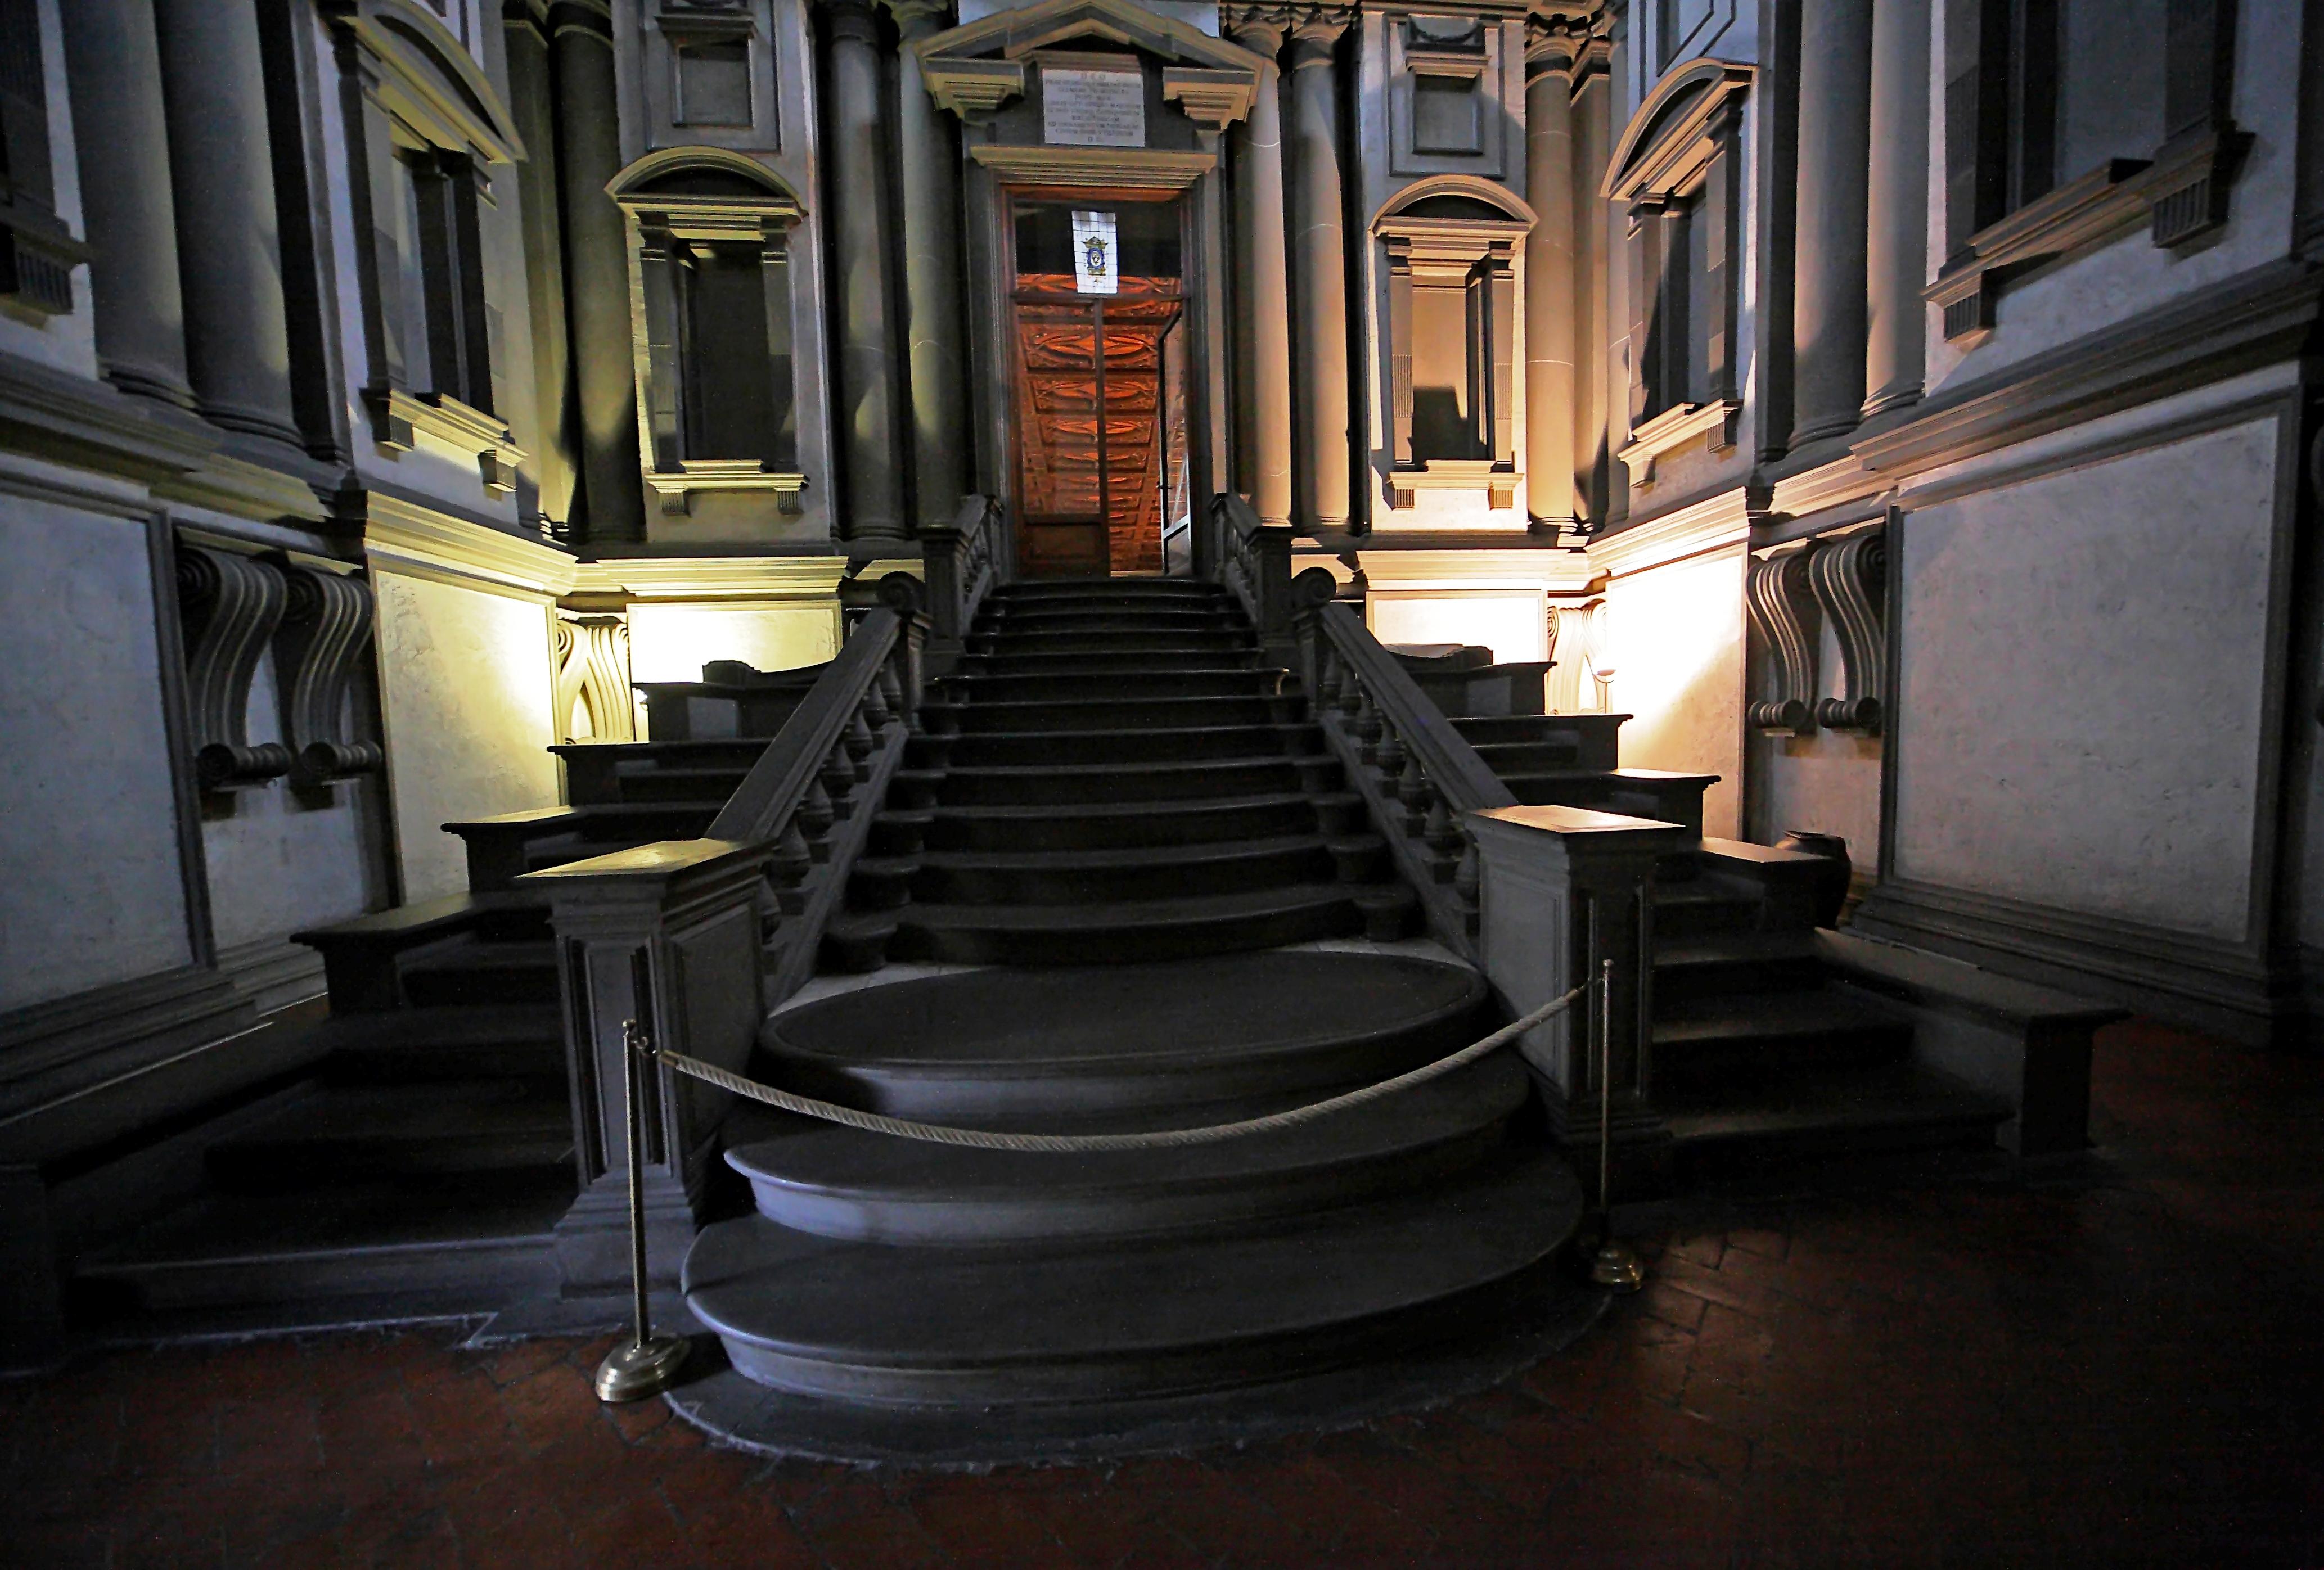 File biblioteca mediceo laurenziana miguel angel - Escalera de biblioteca ...